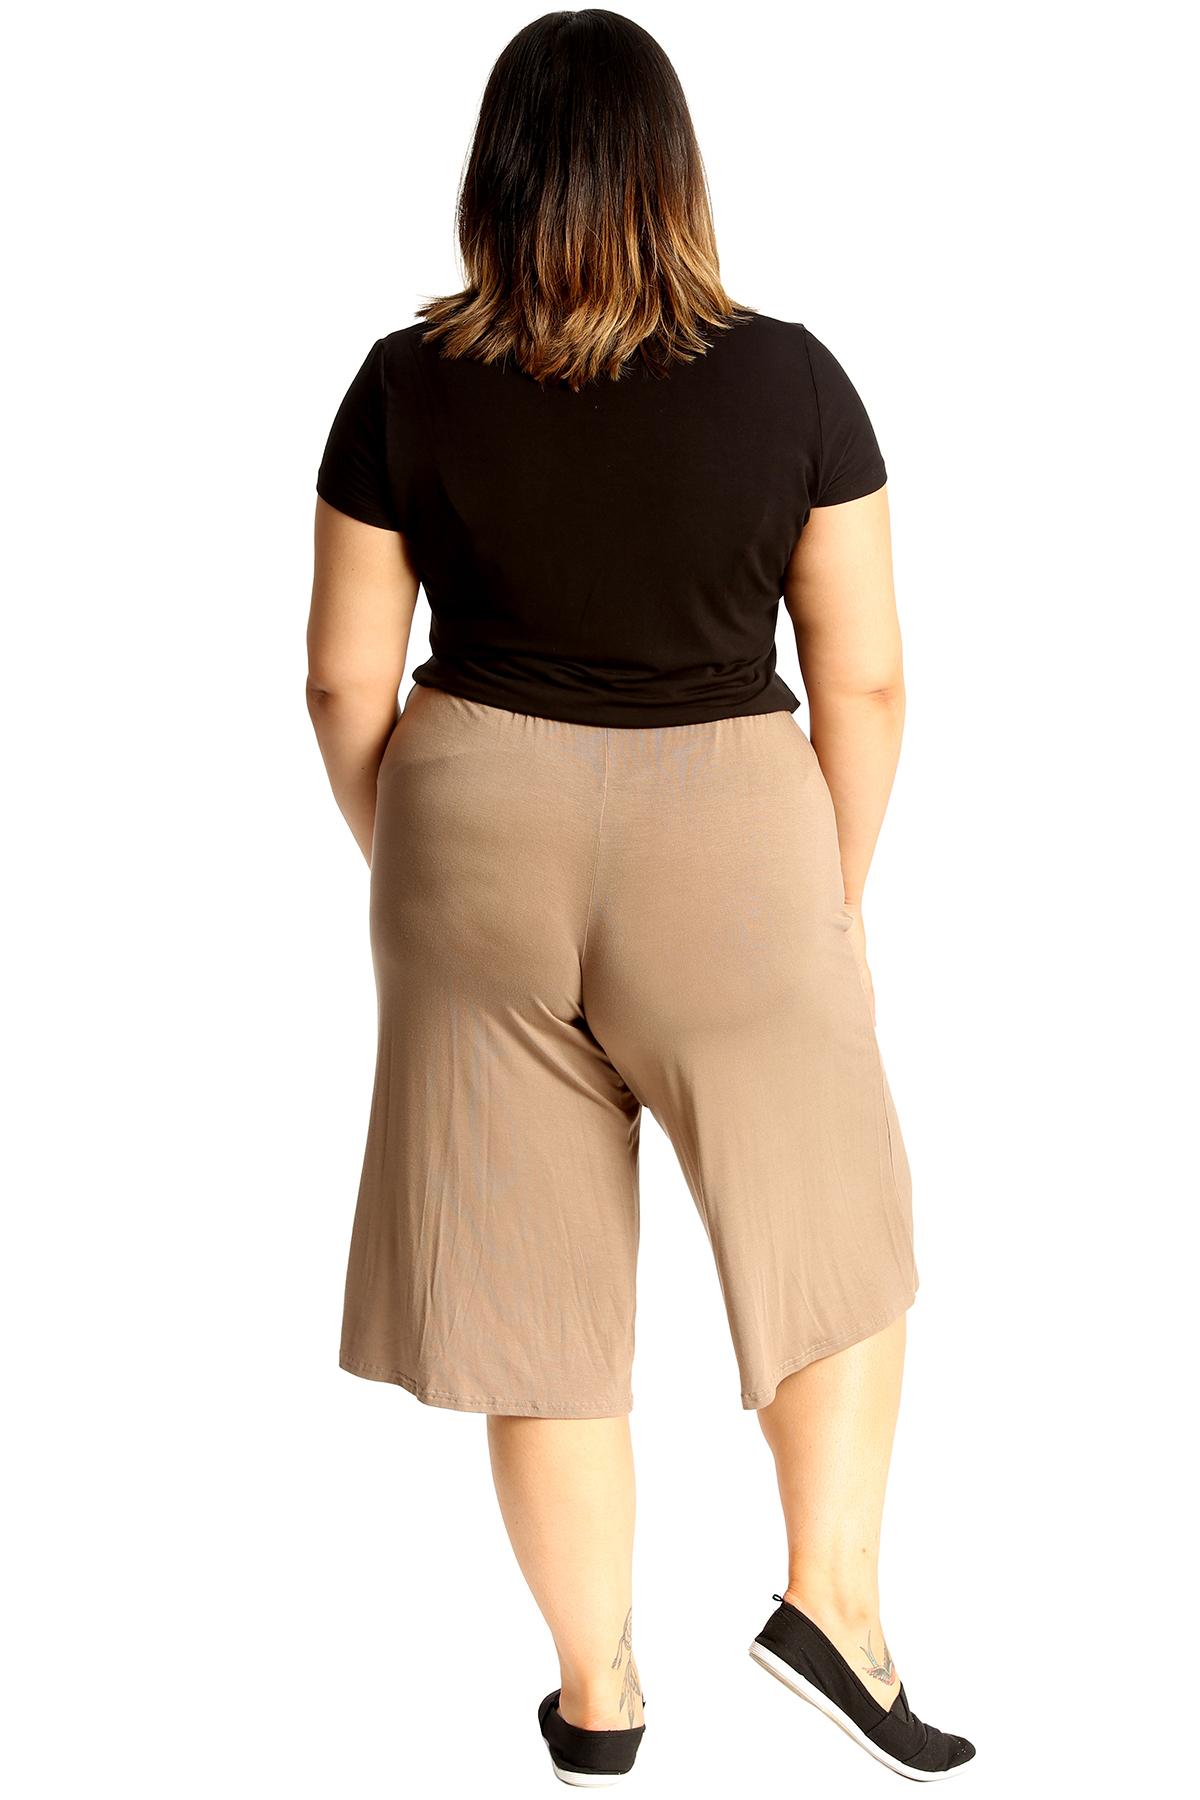 New-Womens-Plus-Size-Culottes-Ladies-Plain-Shorts-Palazzo-Elastic-Pants-Summer thumbnail 28